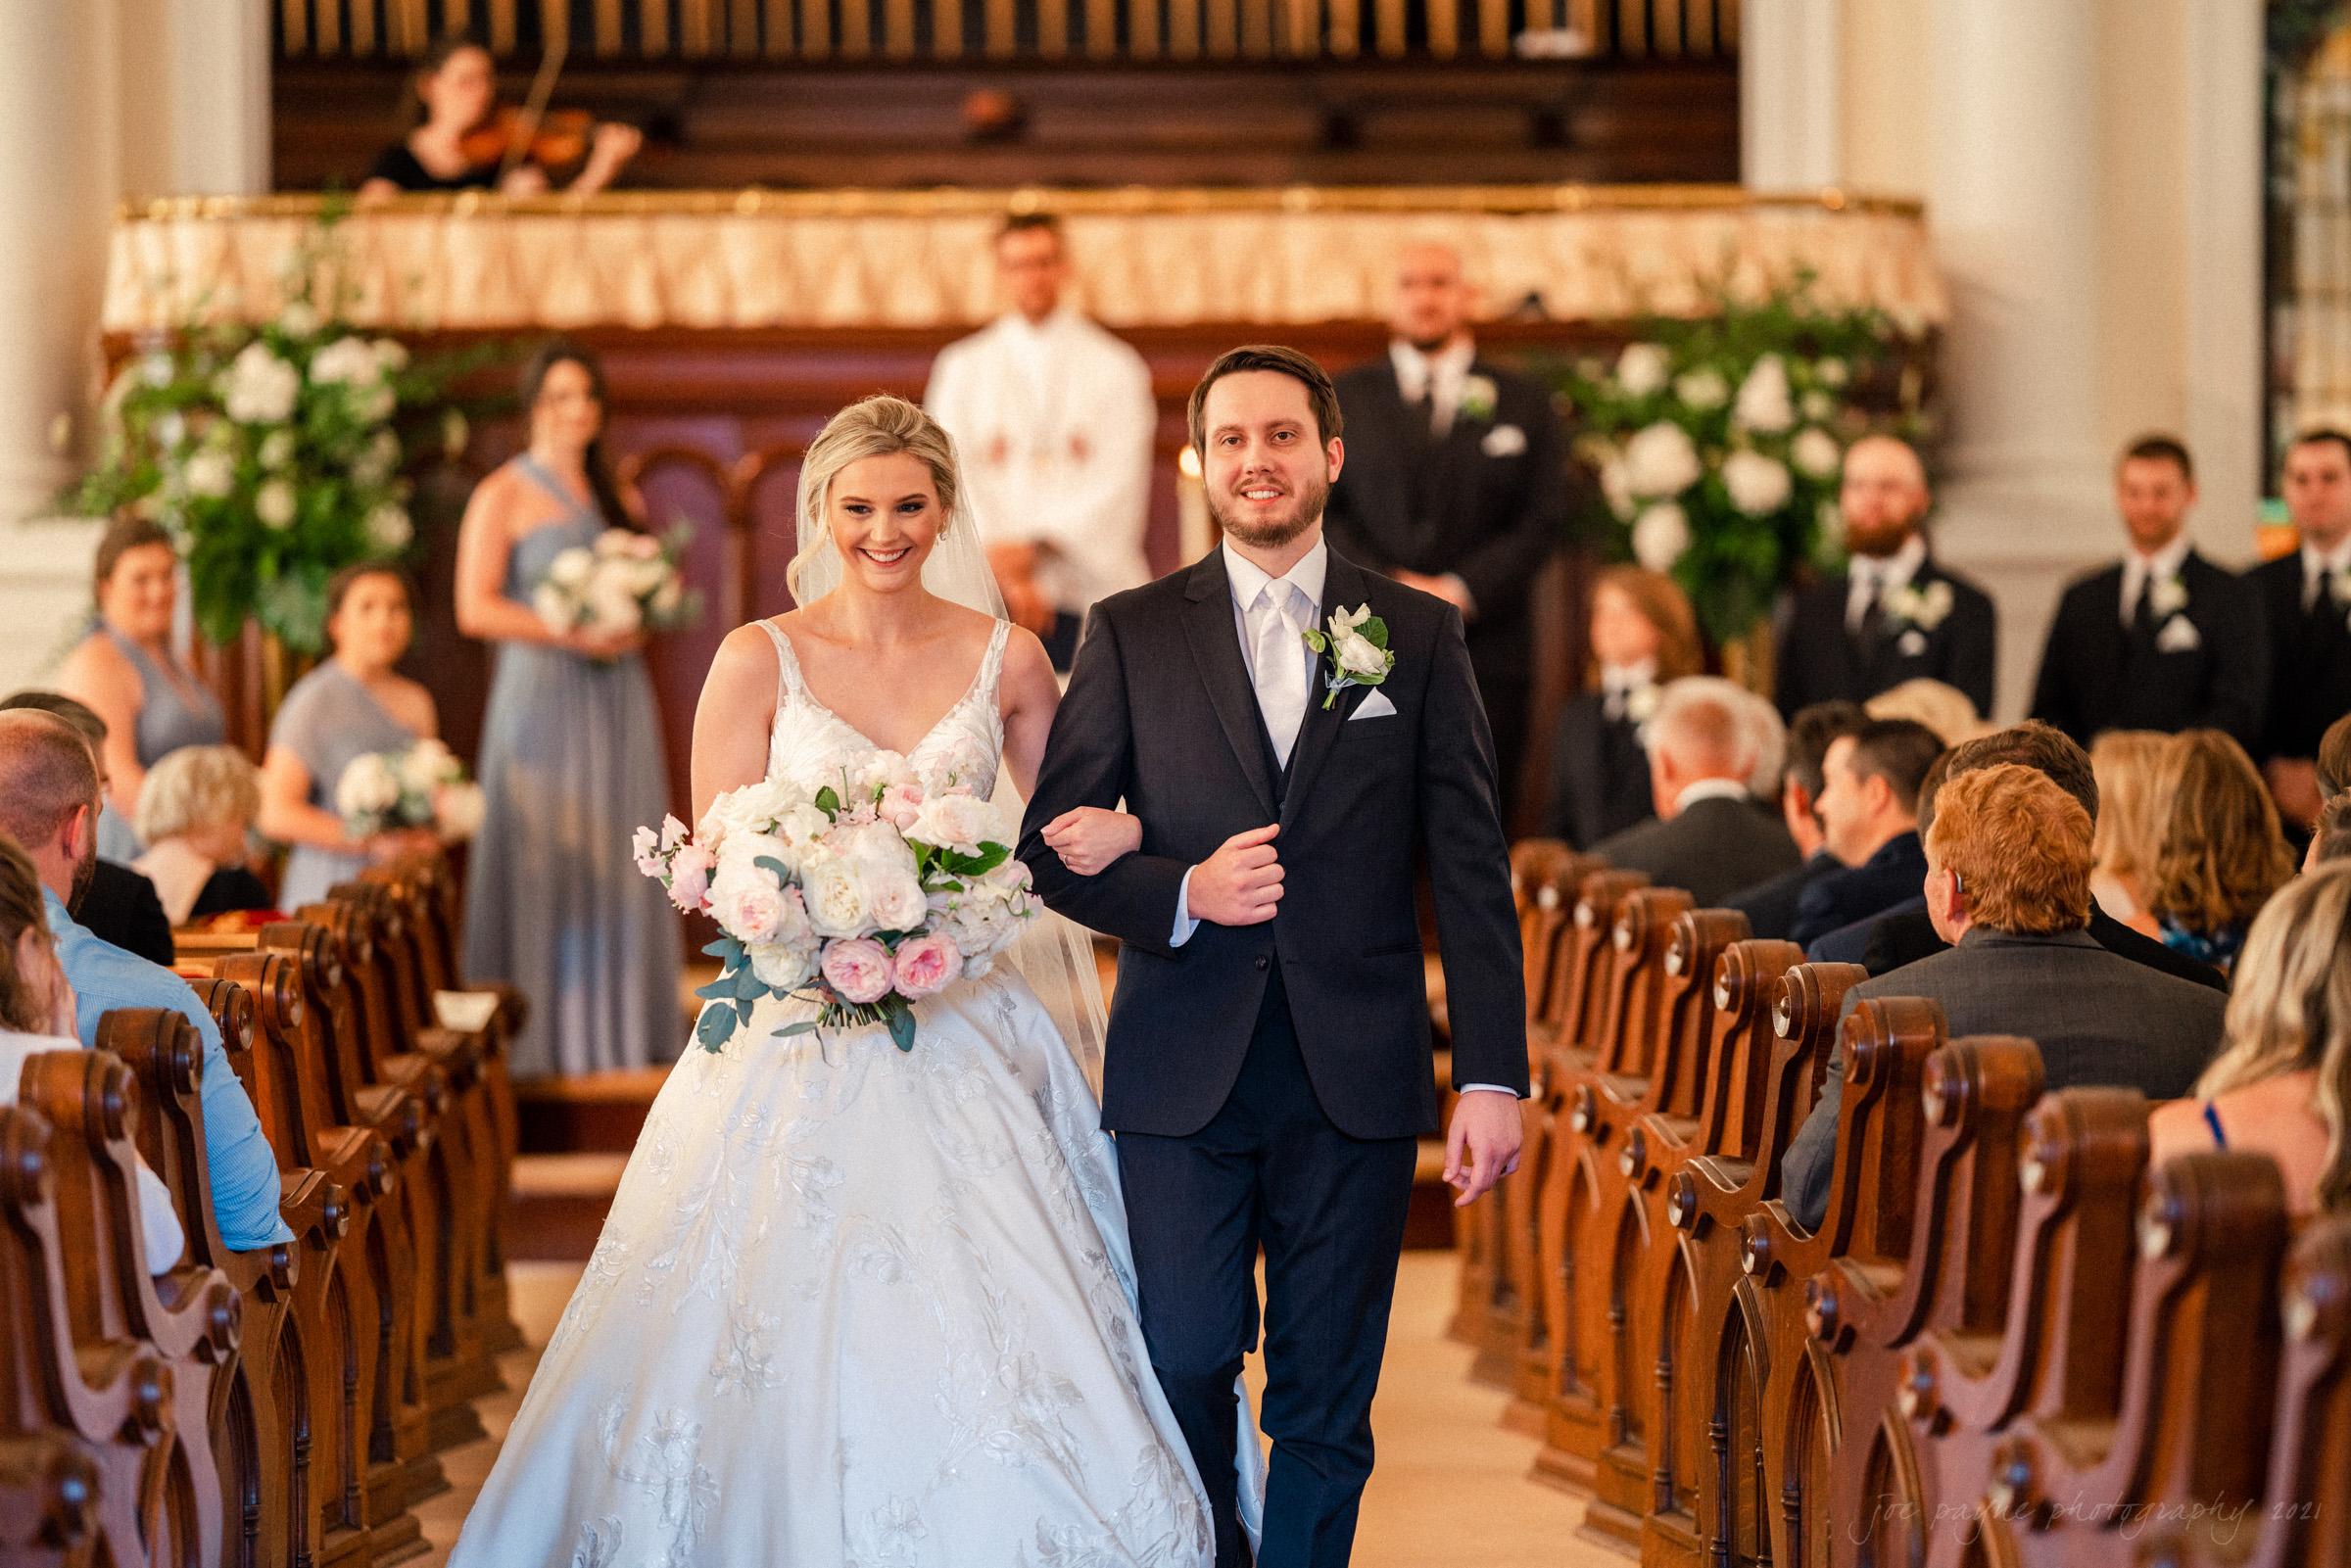 Howard Memorial Presbyterian Church Blount Bridgers House Tarboro NC Wedding Julianne John 19